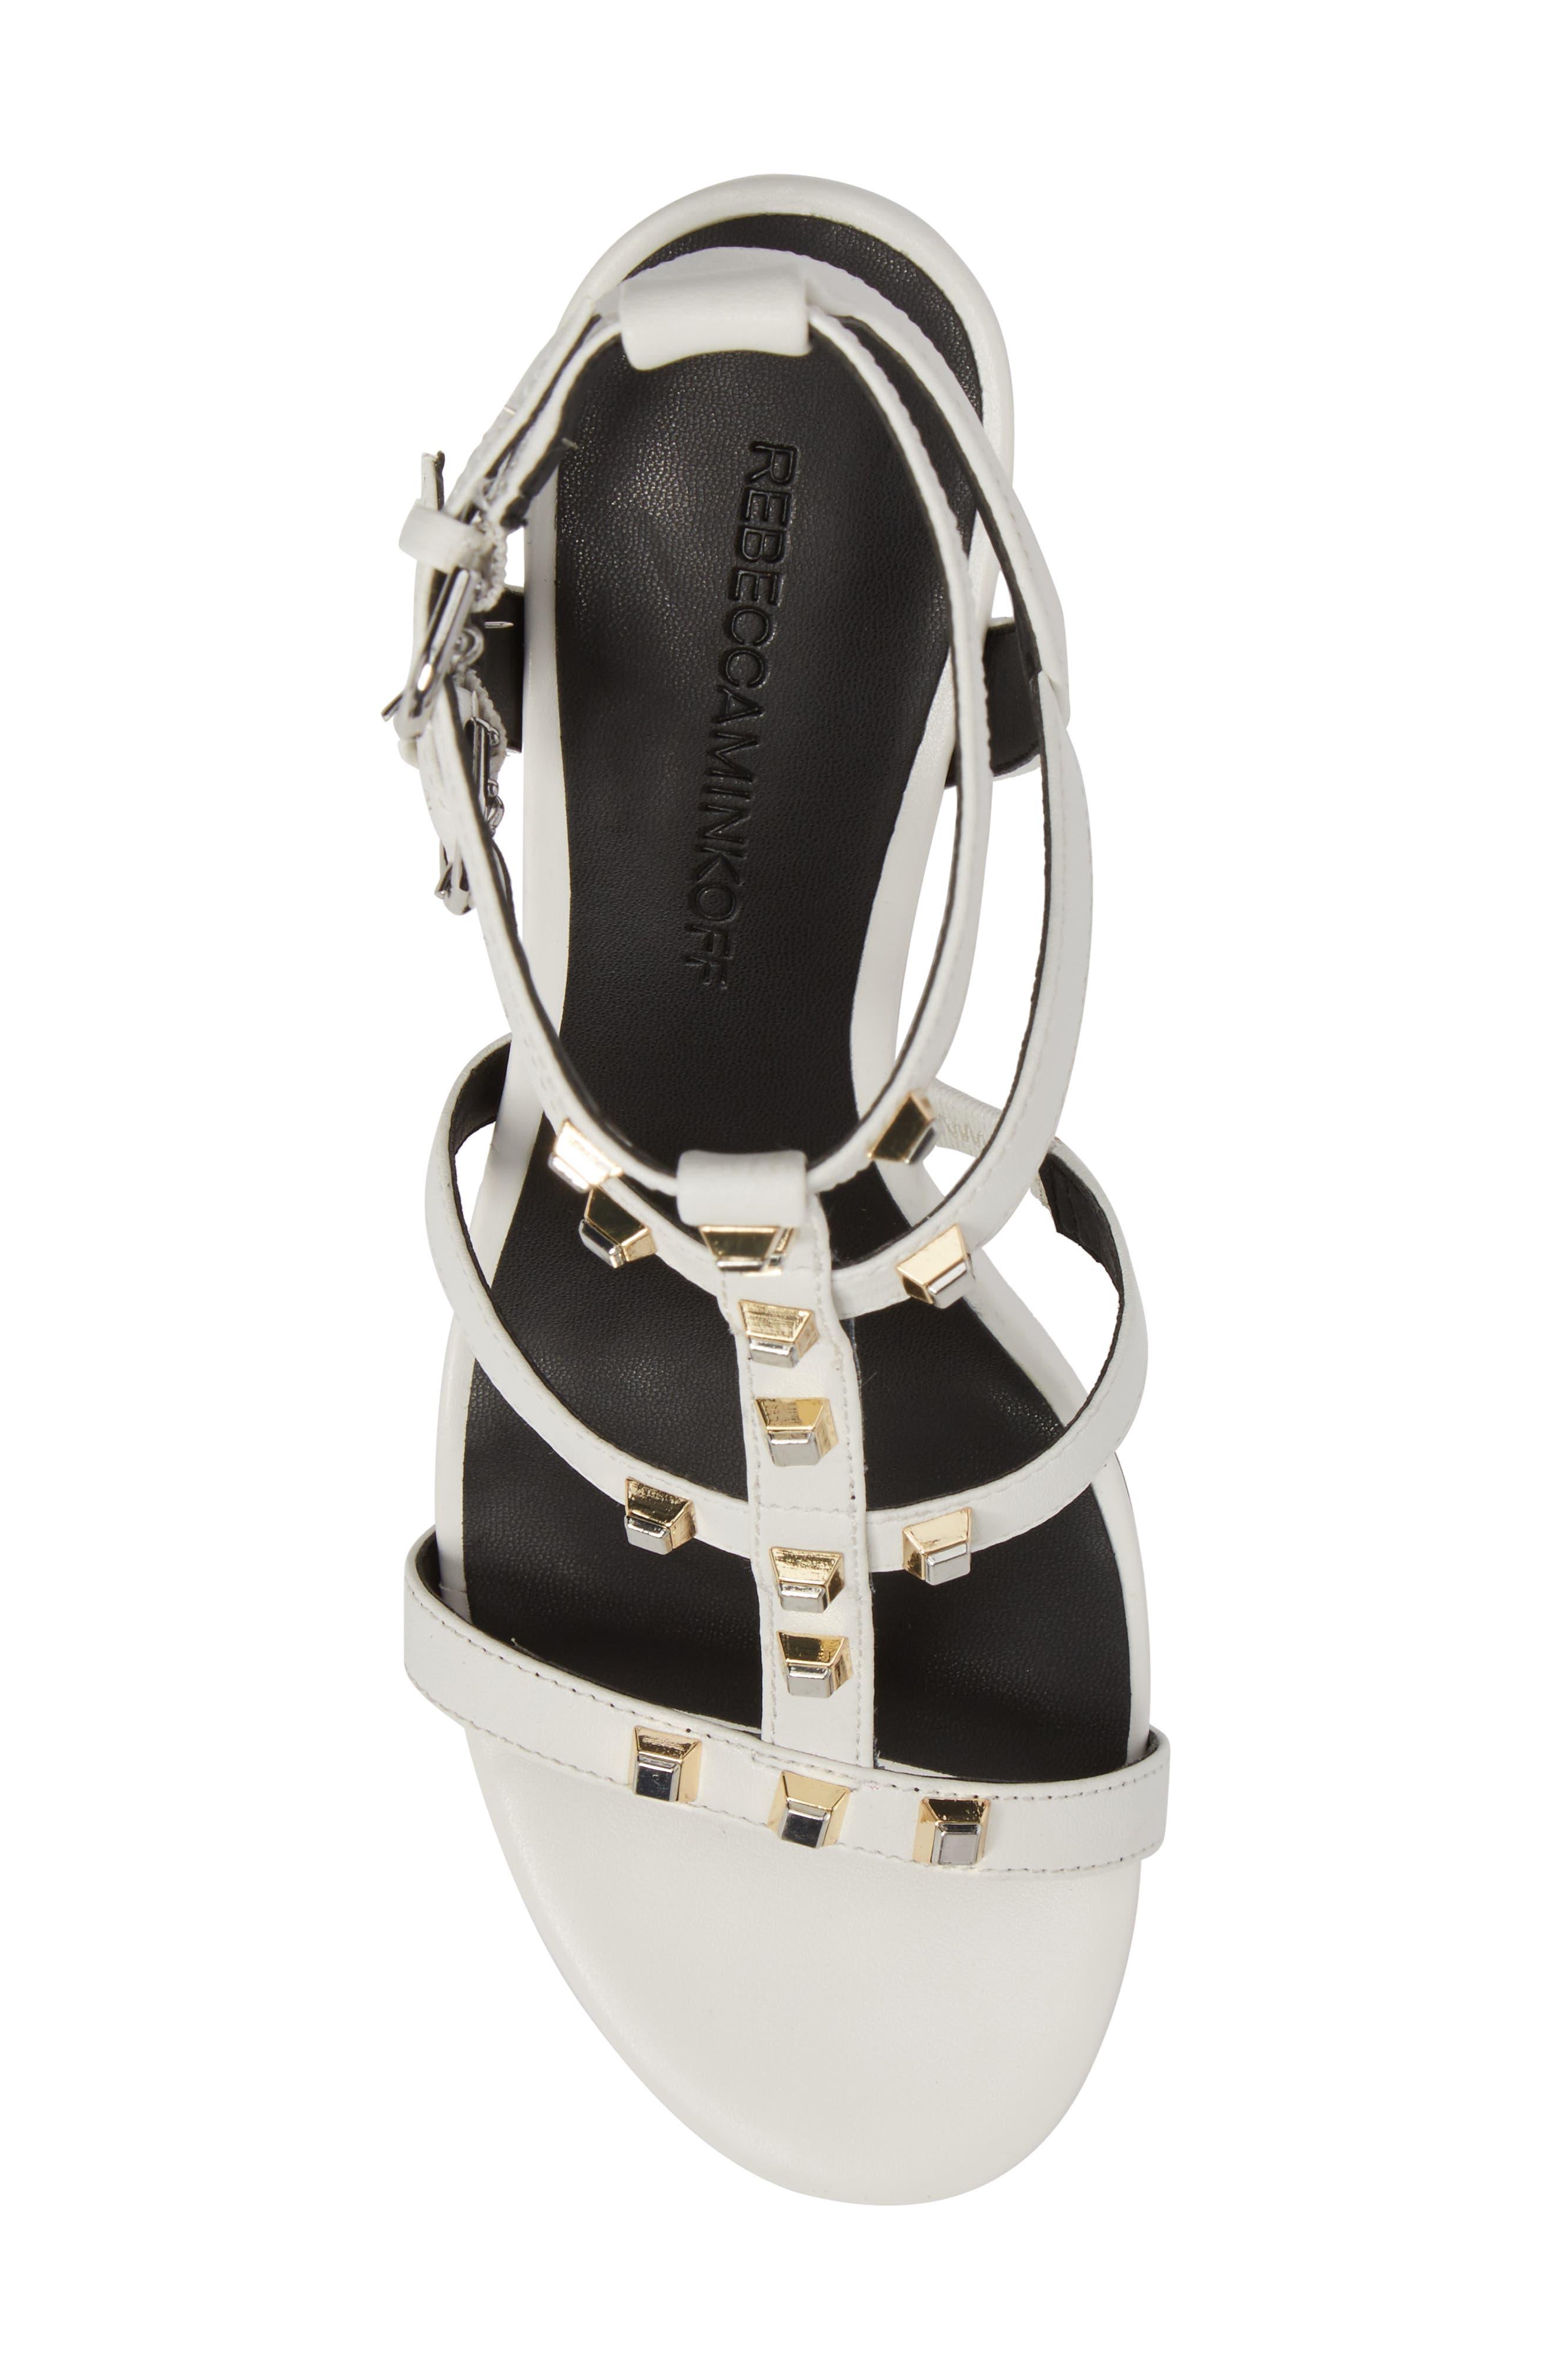 Lenore Sandal,                             Alternate thumbnail 5, color,                             Optic White Leather